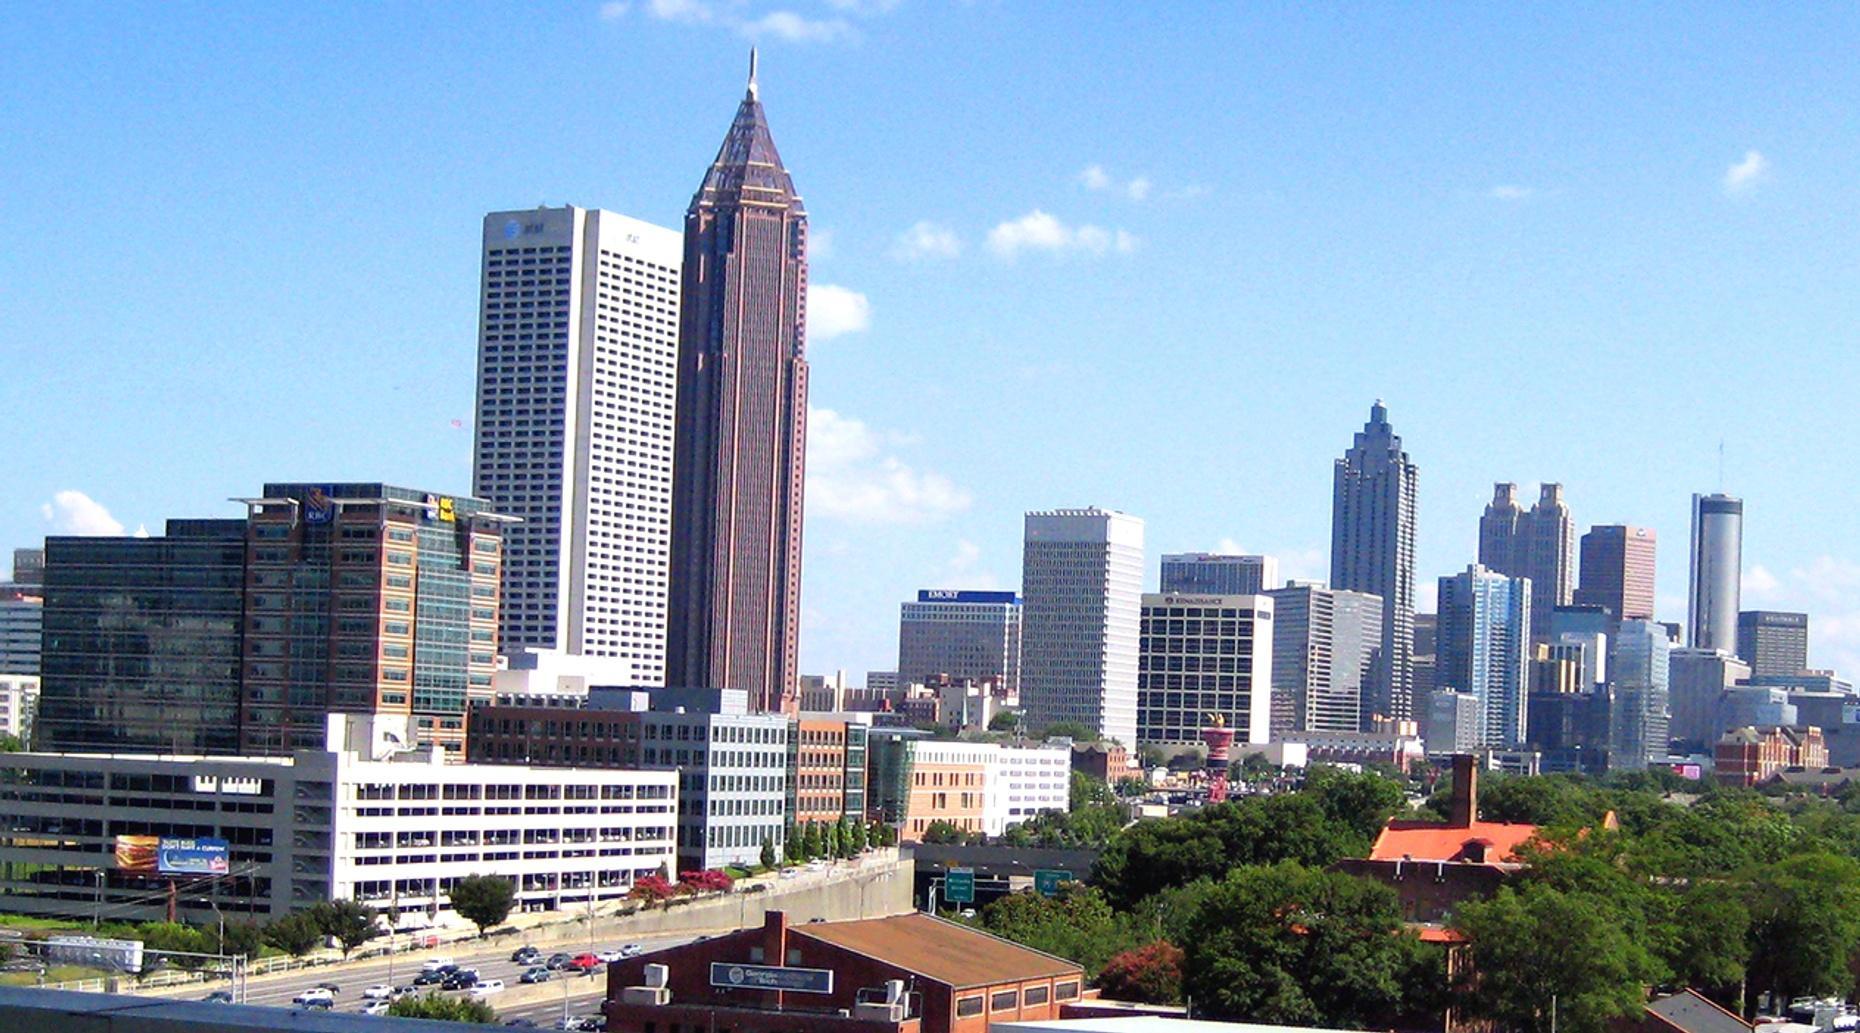 Beltline & Beer Running Tour in Atlanta